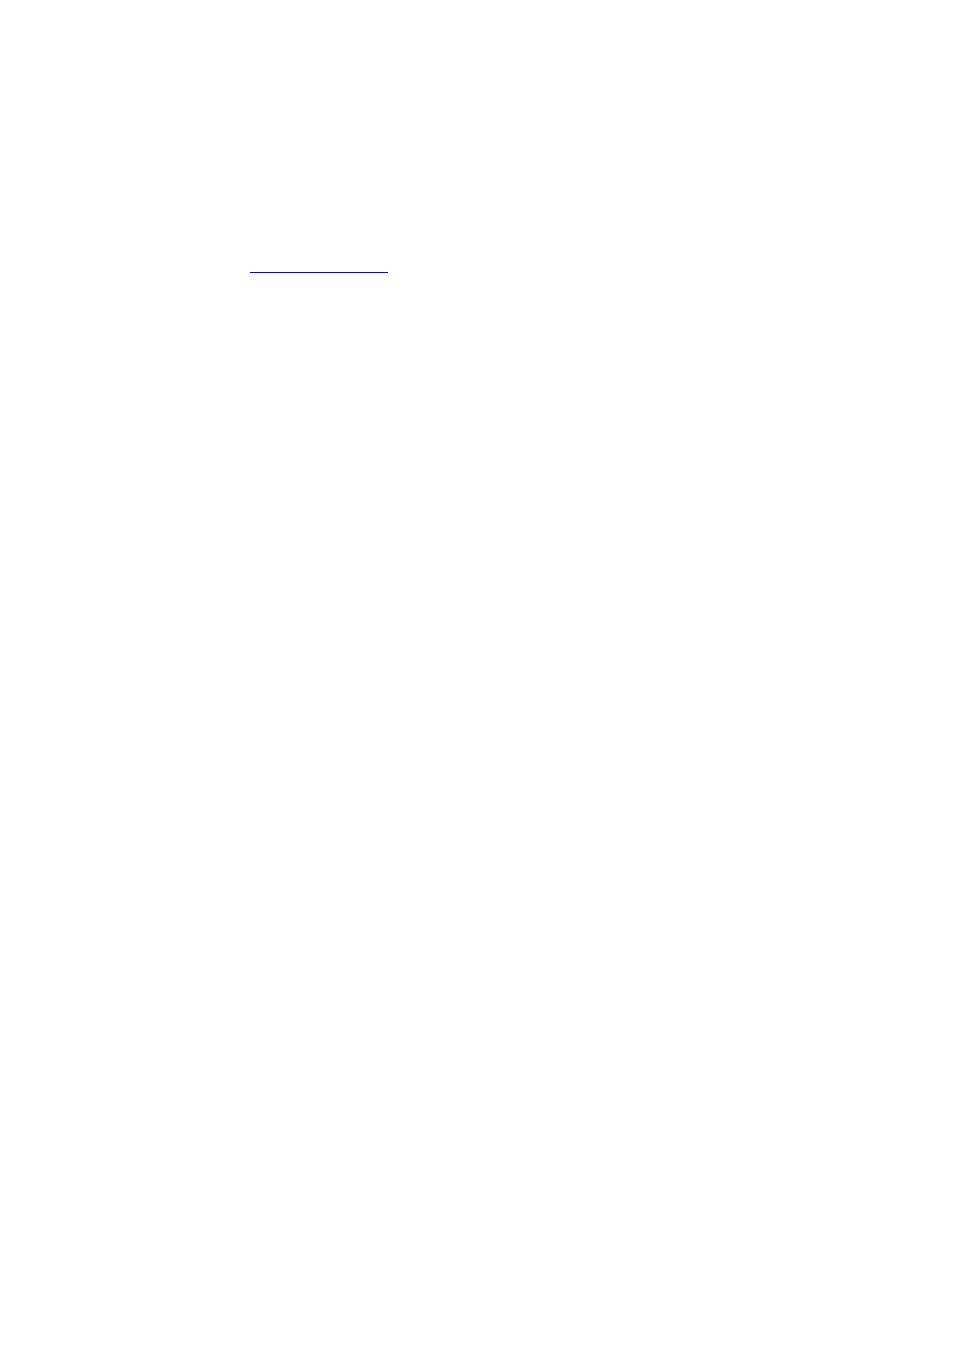 Terminal application settings | Vaisala HMP155 User Manual | Page 28